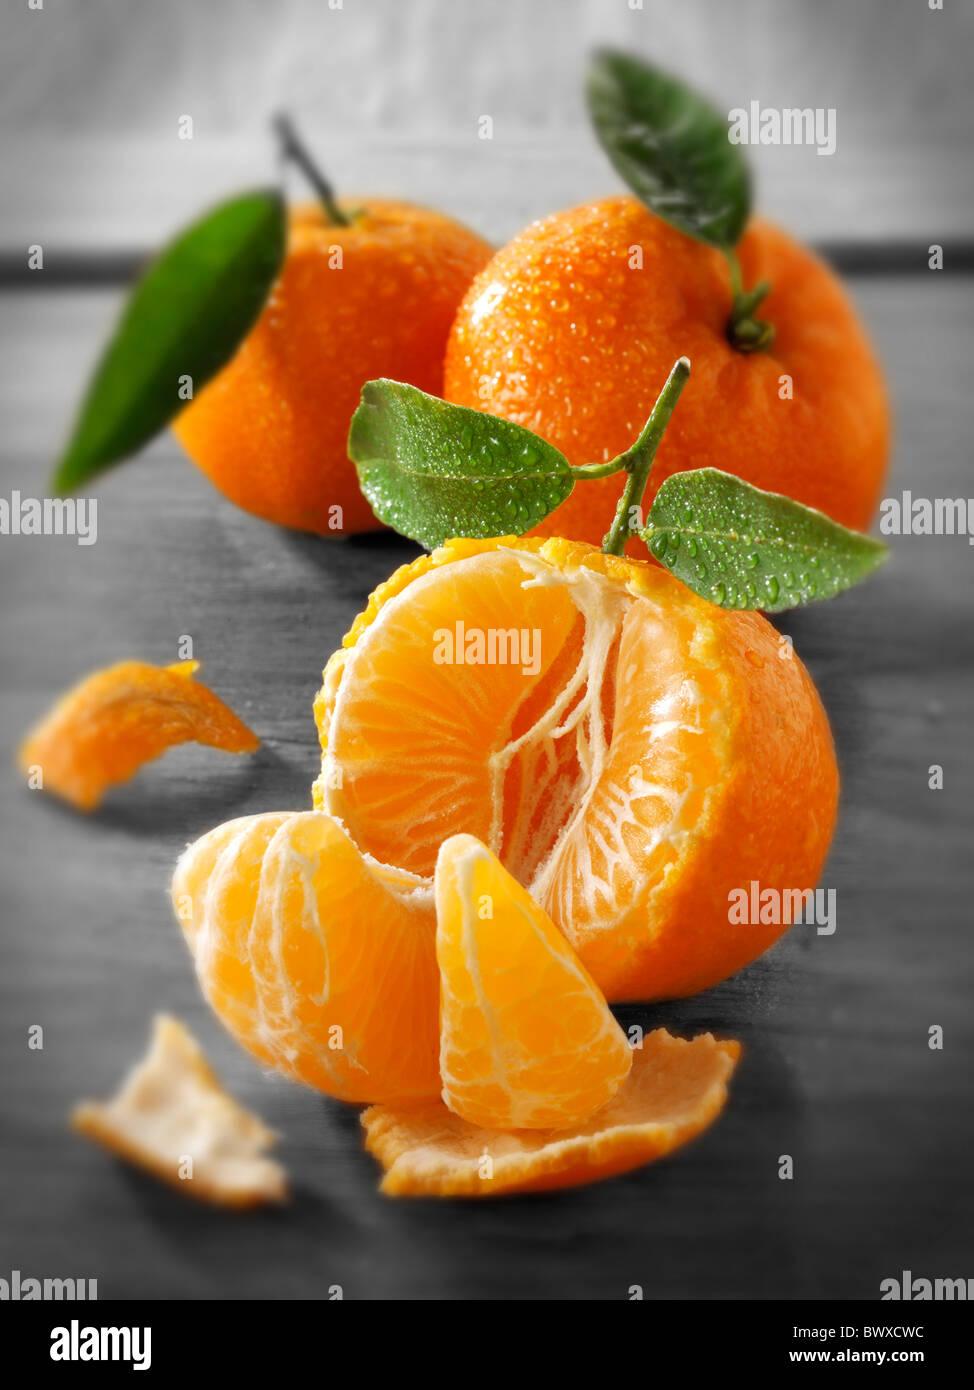 Fresh mandarins fruits with leaves. - Stock Image